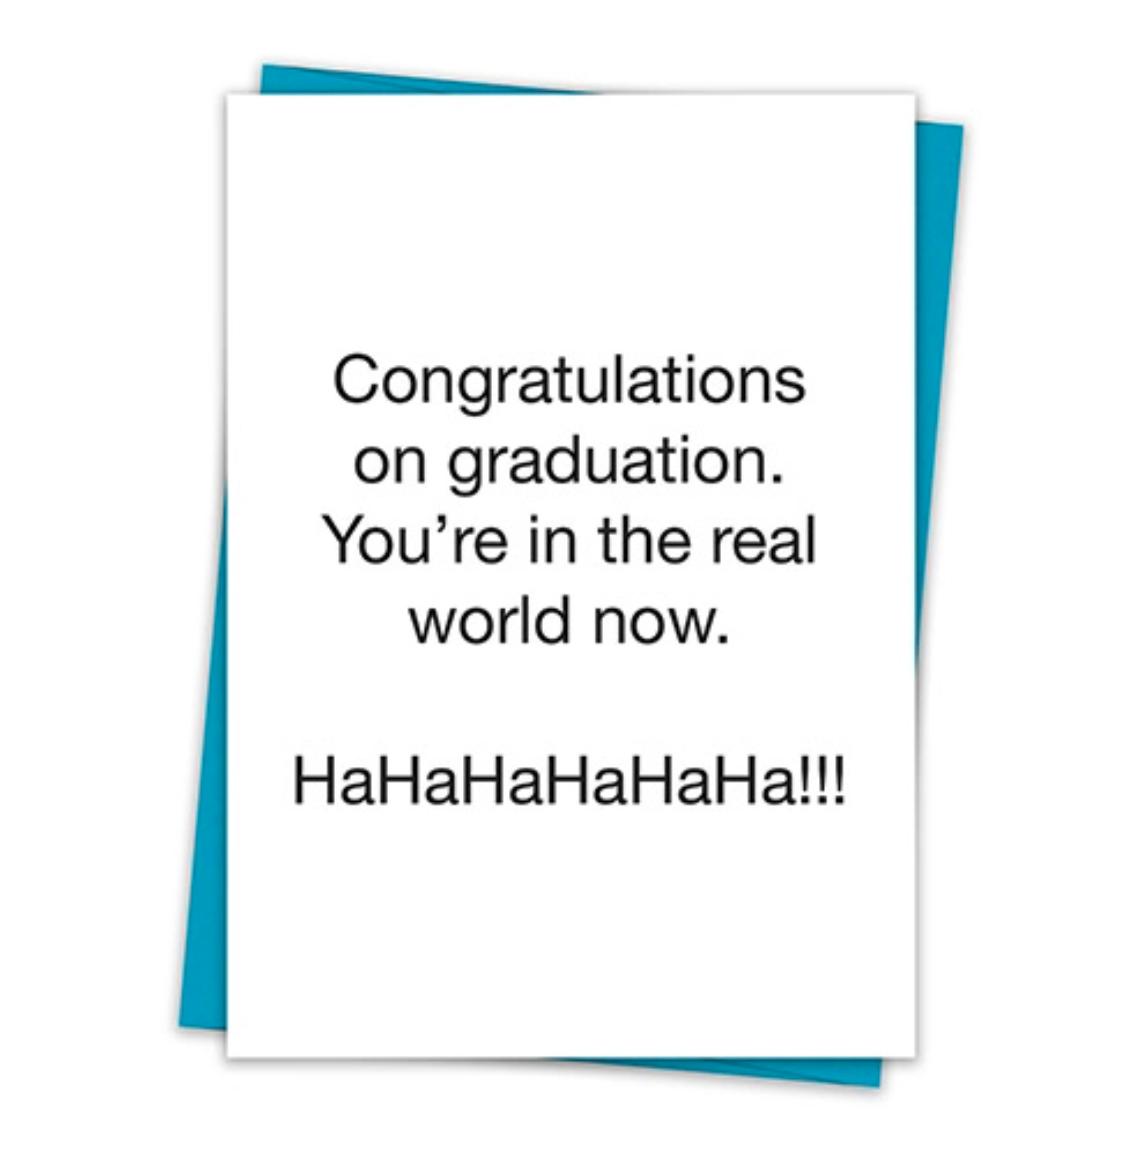 TA Card congratulations on your graduation